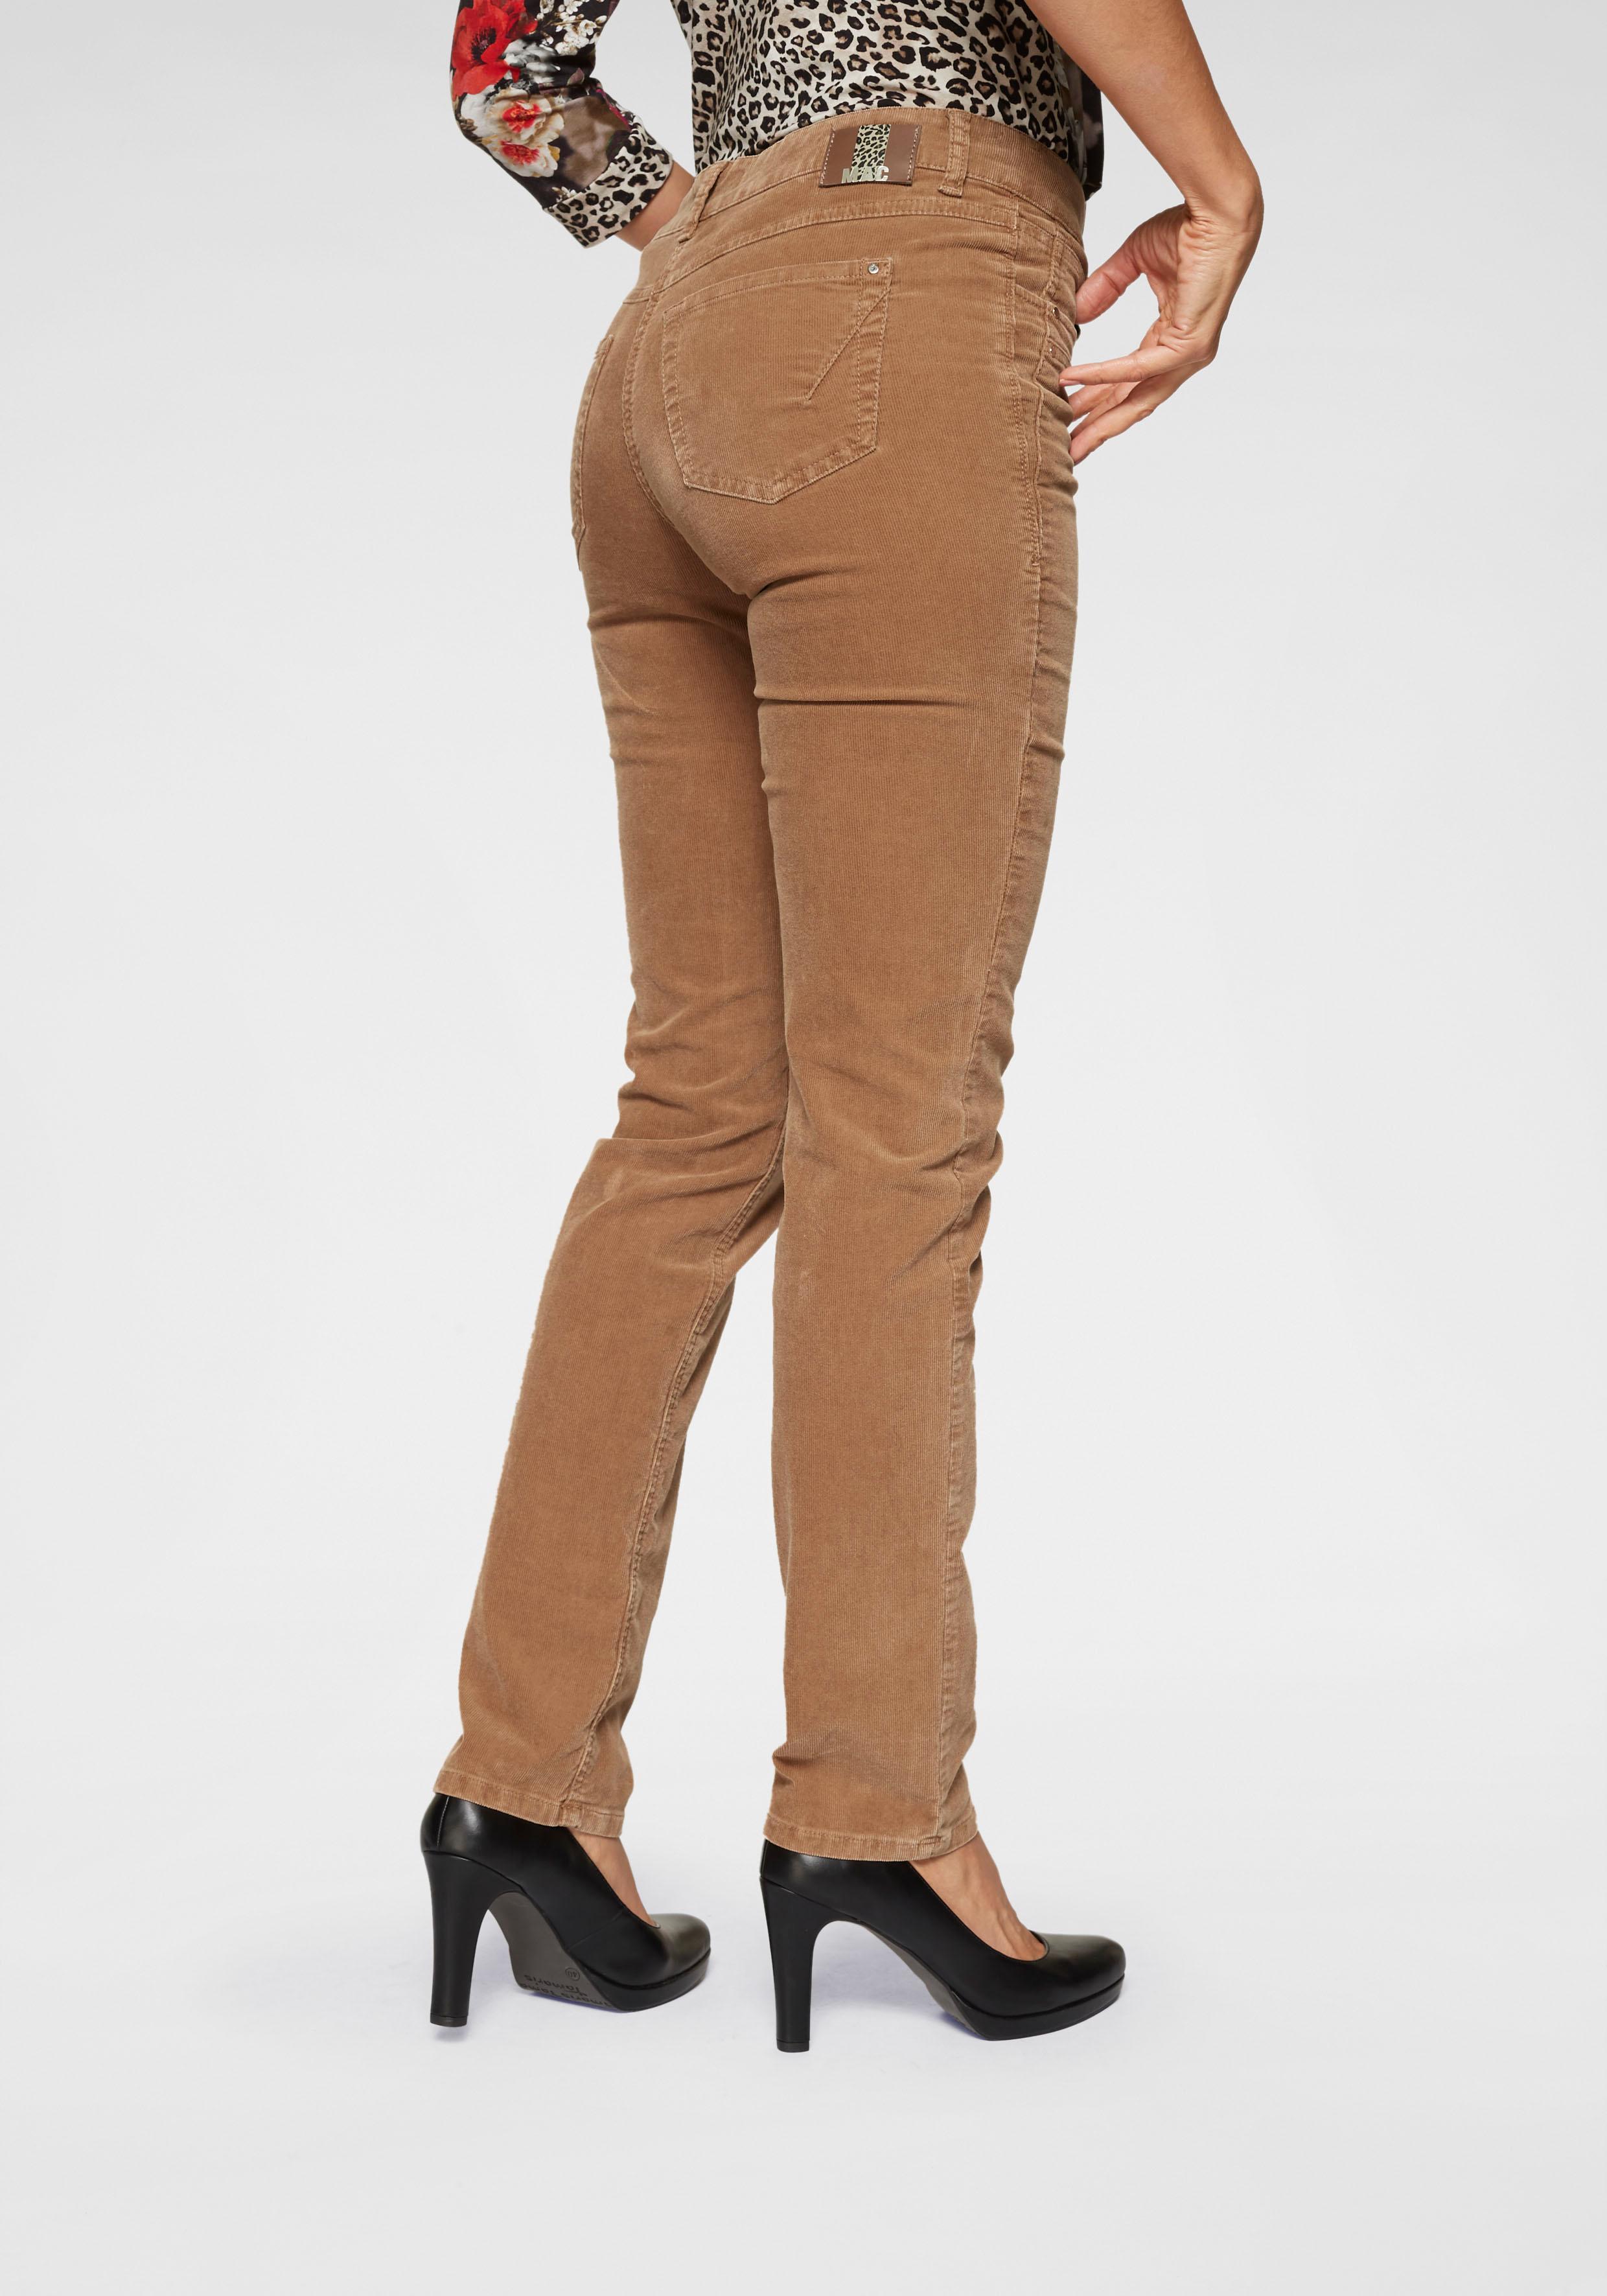 MAC Gerade Jeans New Angela Corduroy   Bekleidung > Jeans > Gerade Jeans   Mac